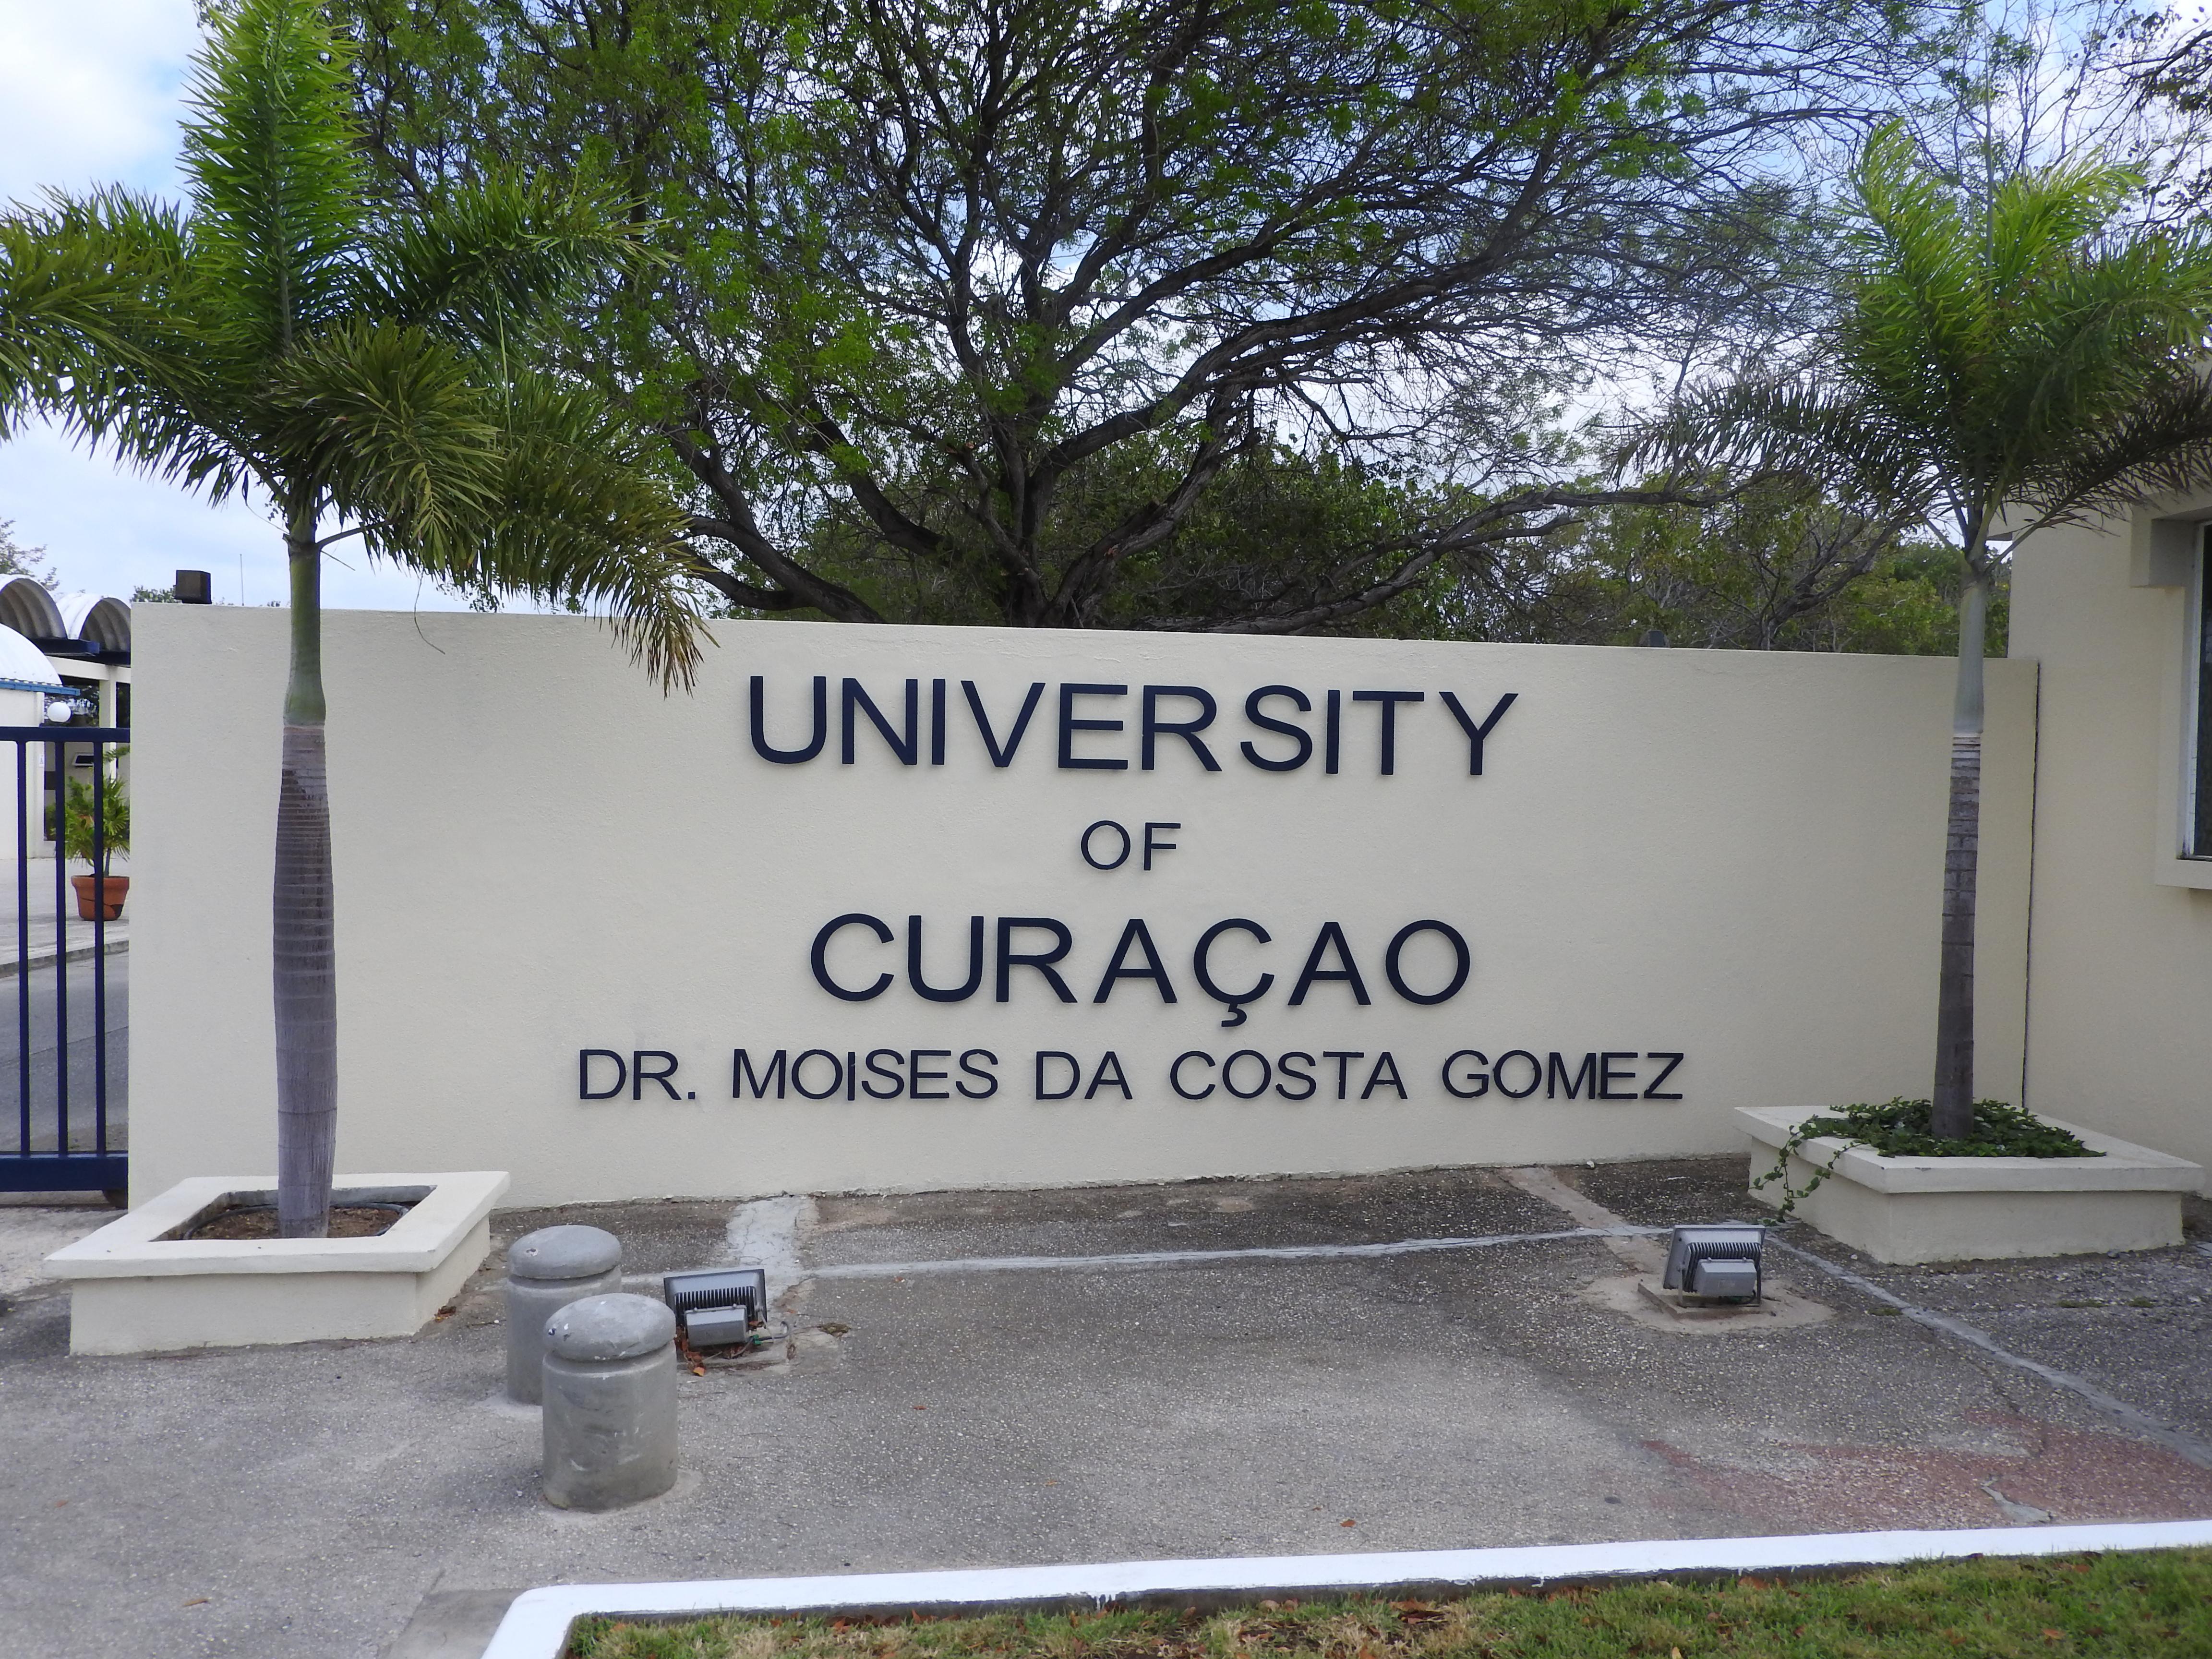 University of Curaçao - Wikipedia